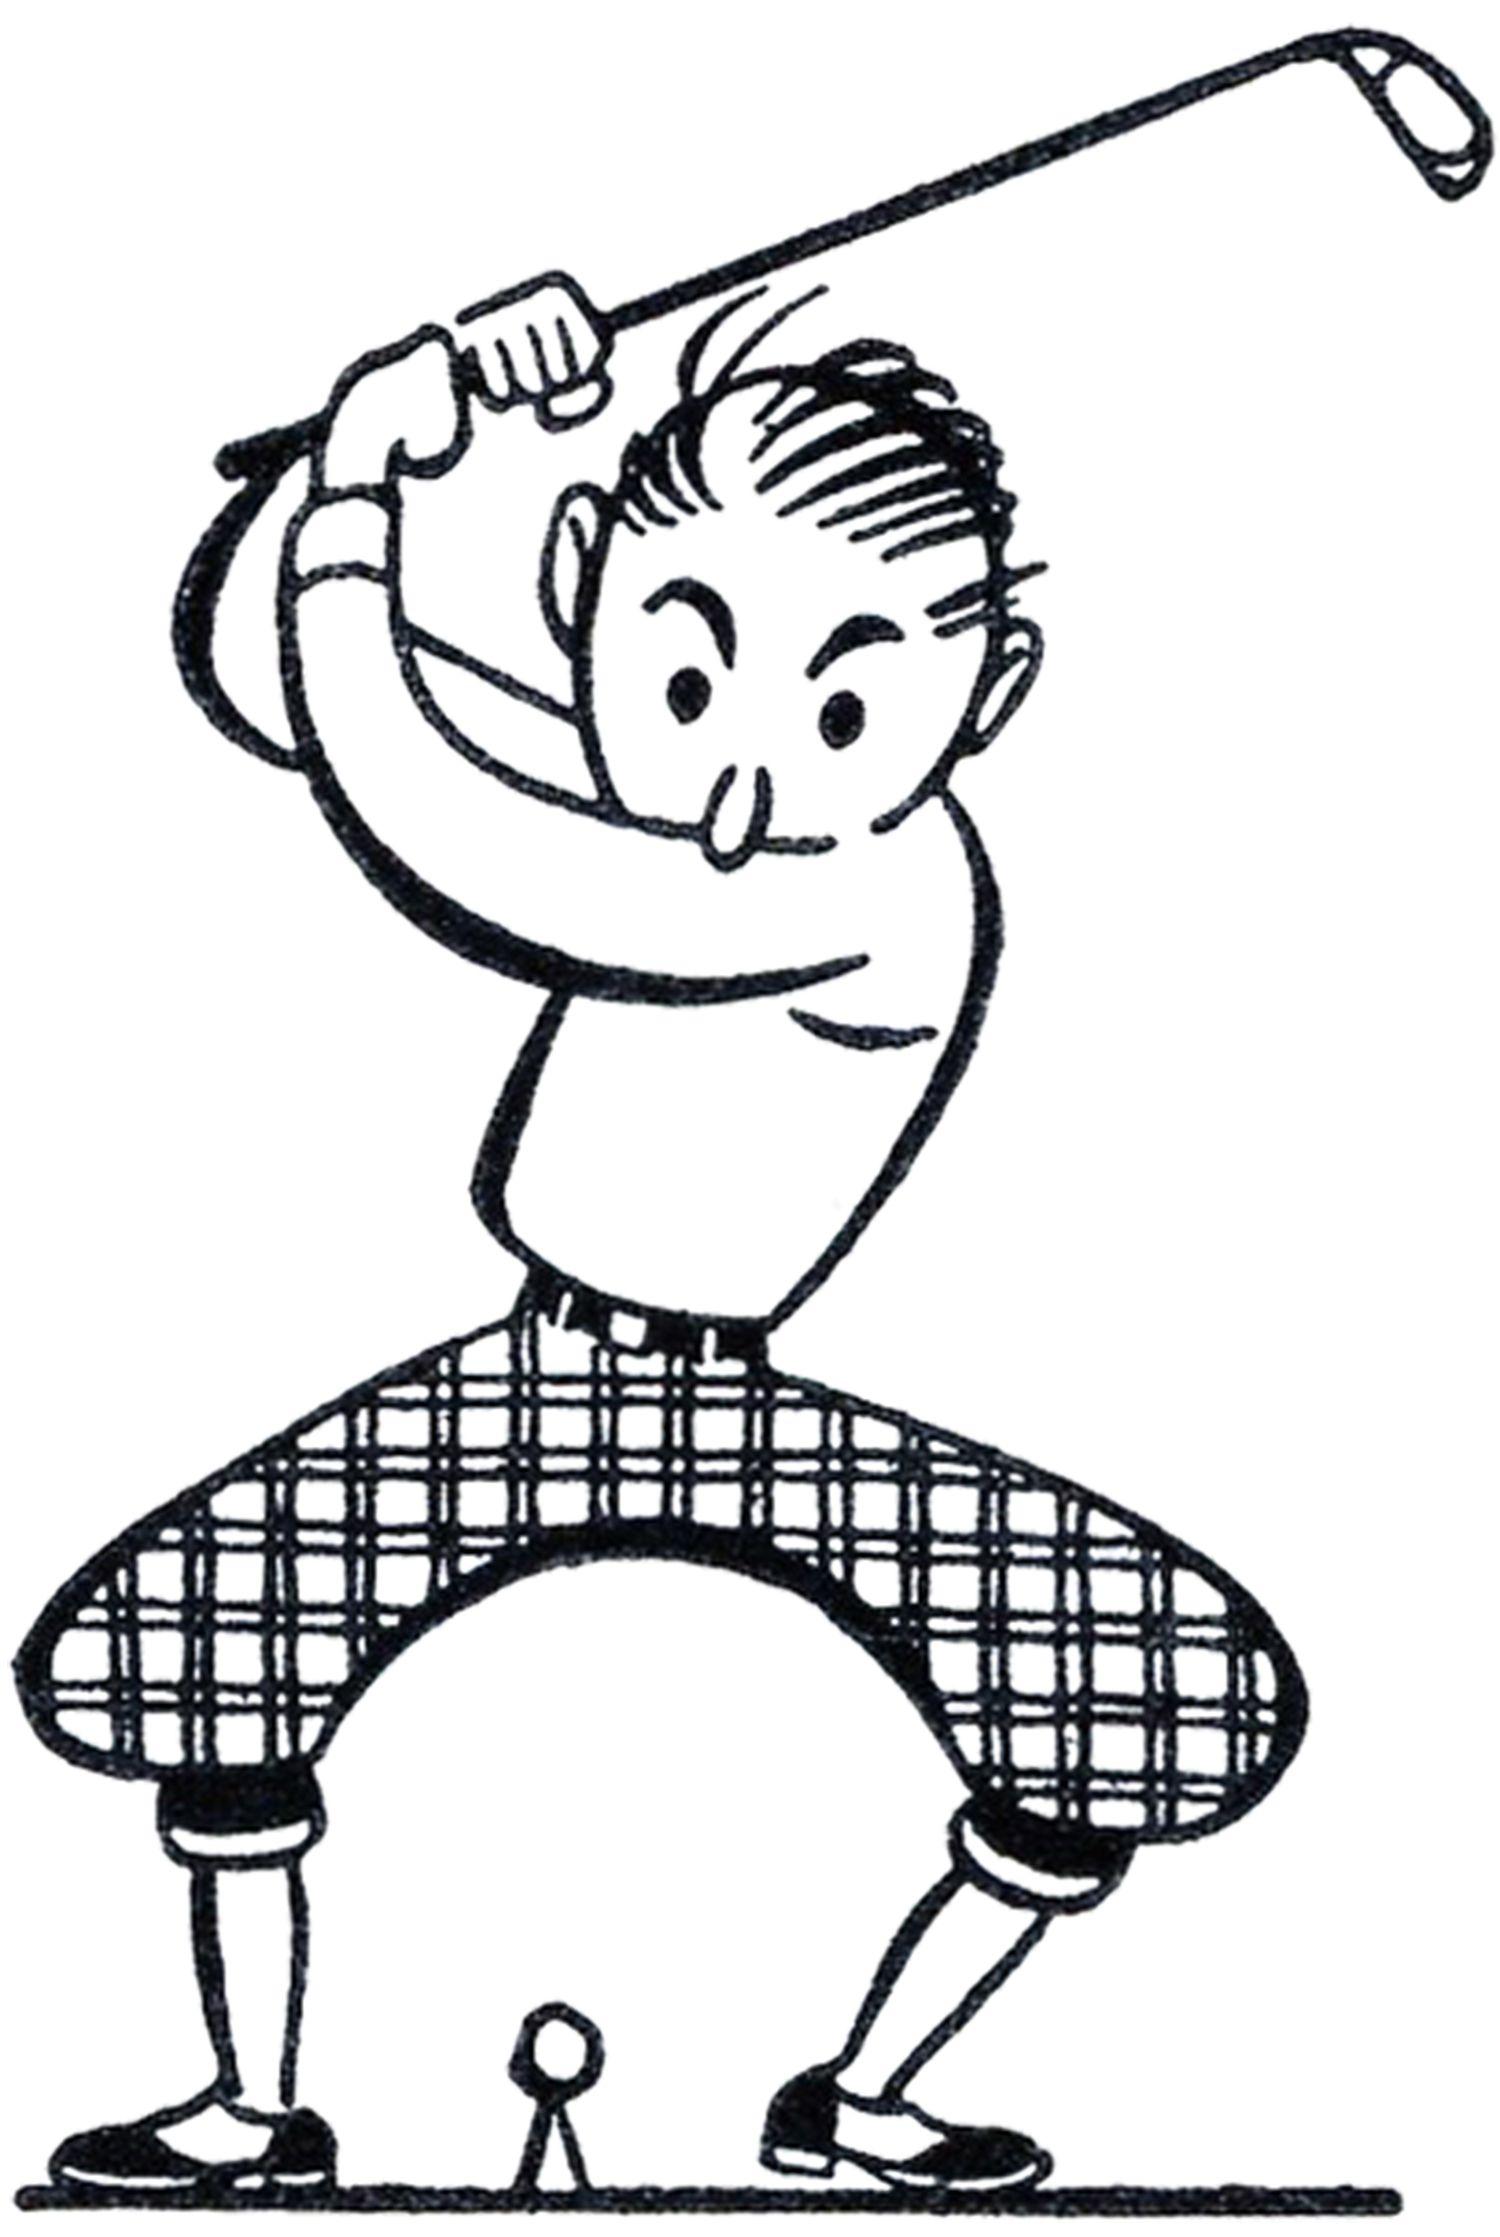 Retro Golf Clip Art Funny Pinterest Siluetas Deporte Y Negro